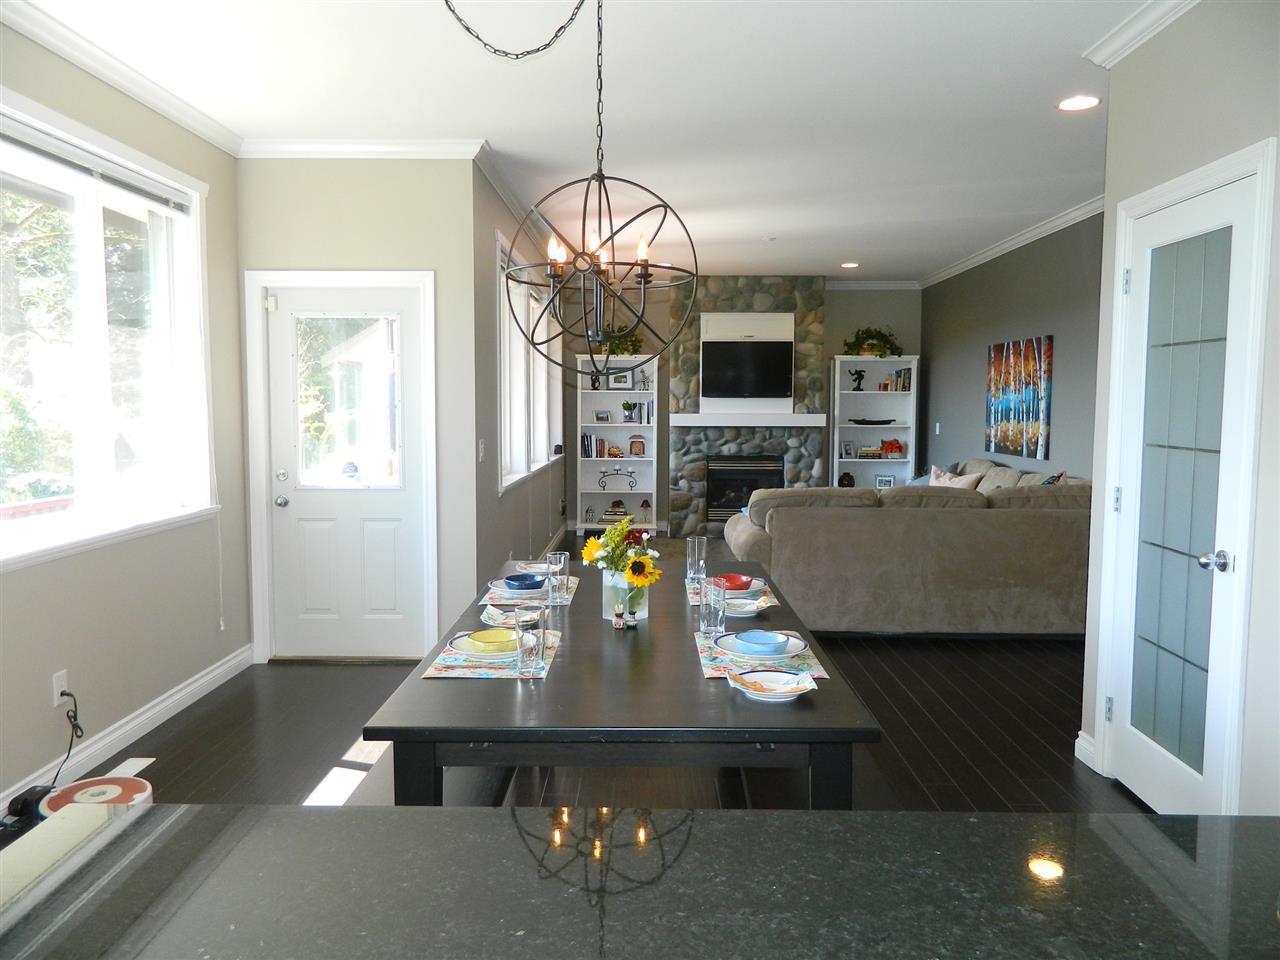 Photo 8: Photos: 24332 104 AVENUE in Maple Ridge: Albion House for sale : MLS®# R2051414